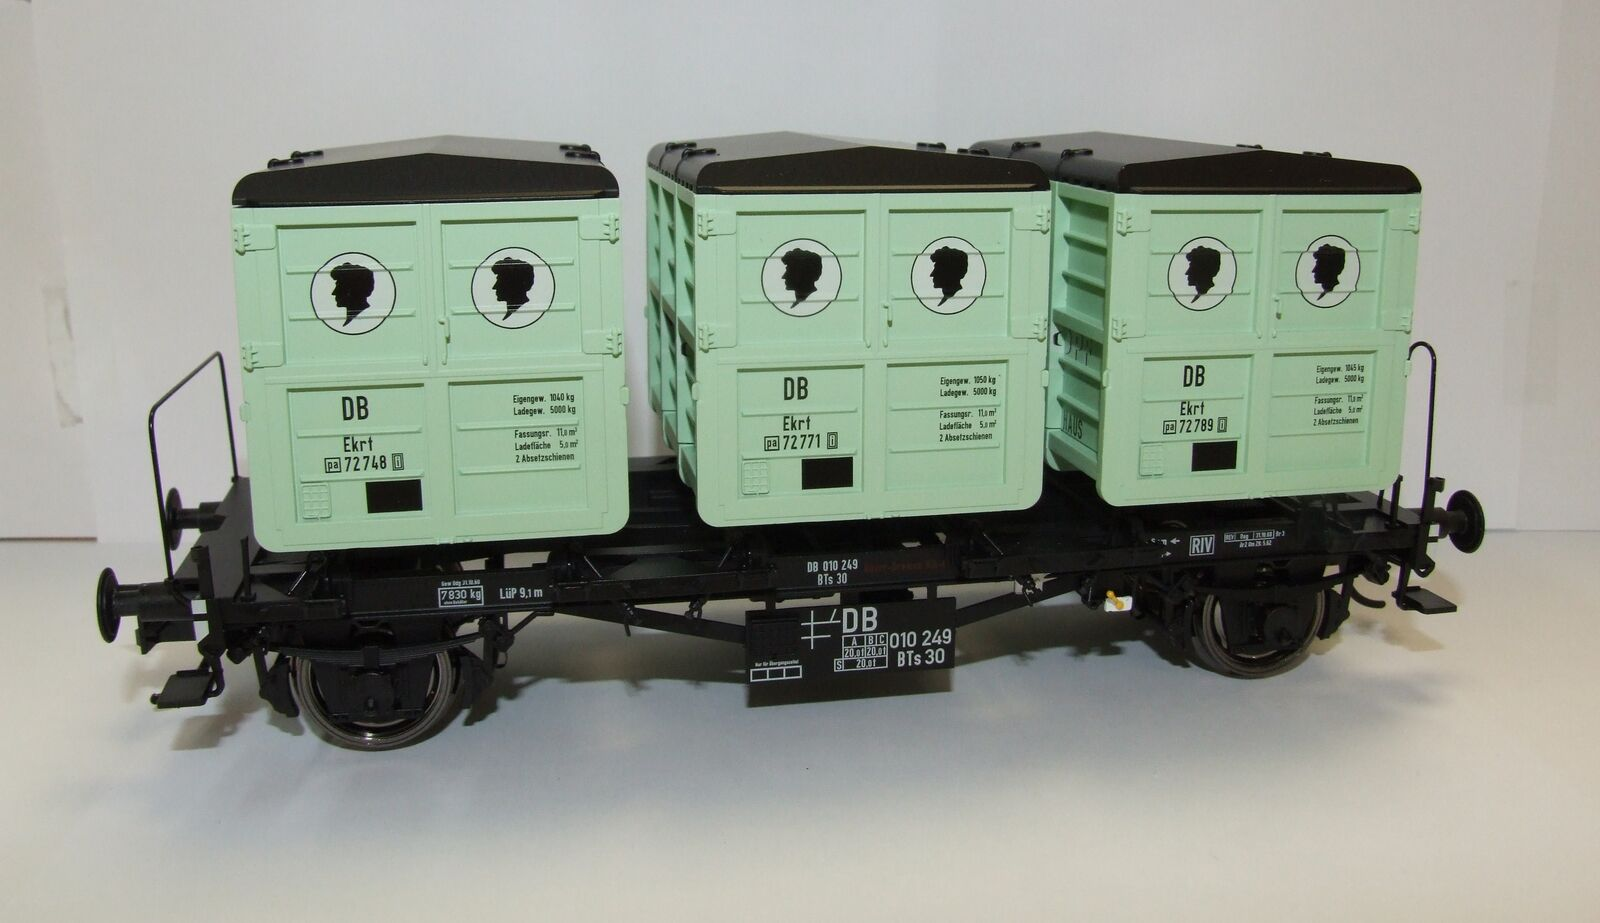 Brawa 37159 Escala 0 Vagón Transporte Contenedores Bts30 DB III negrokopf